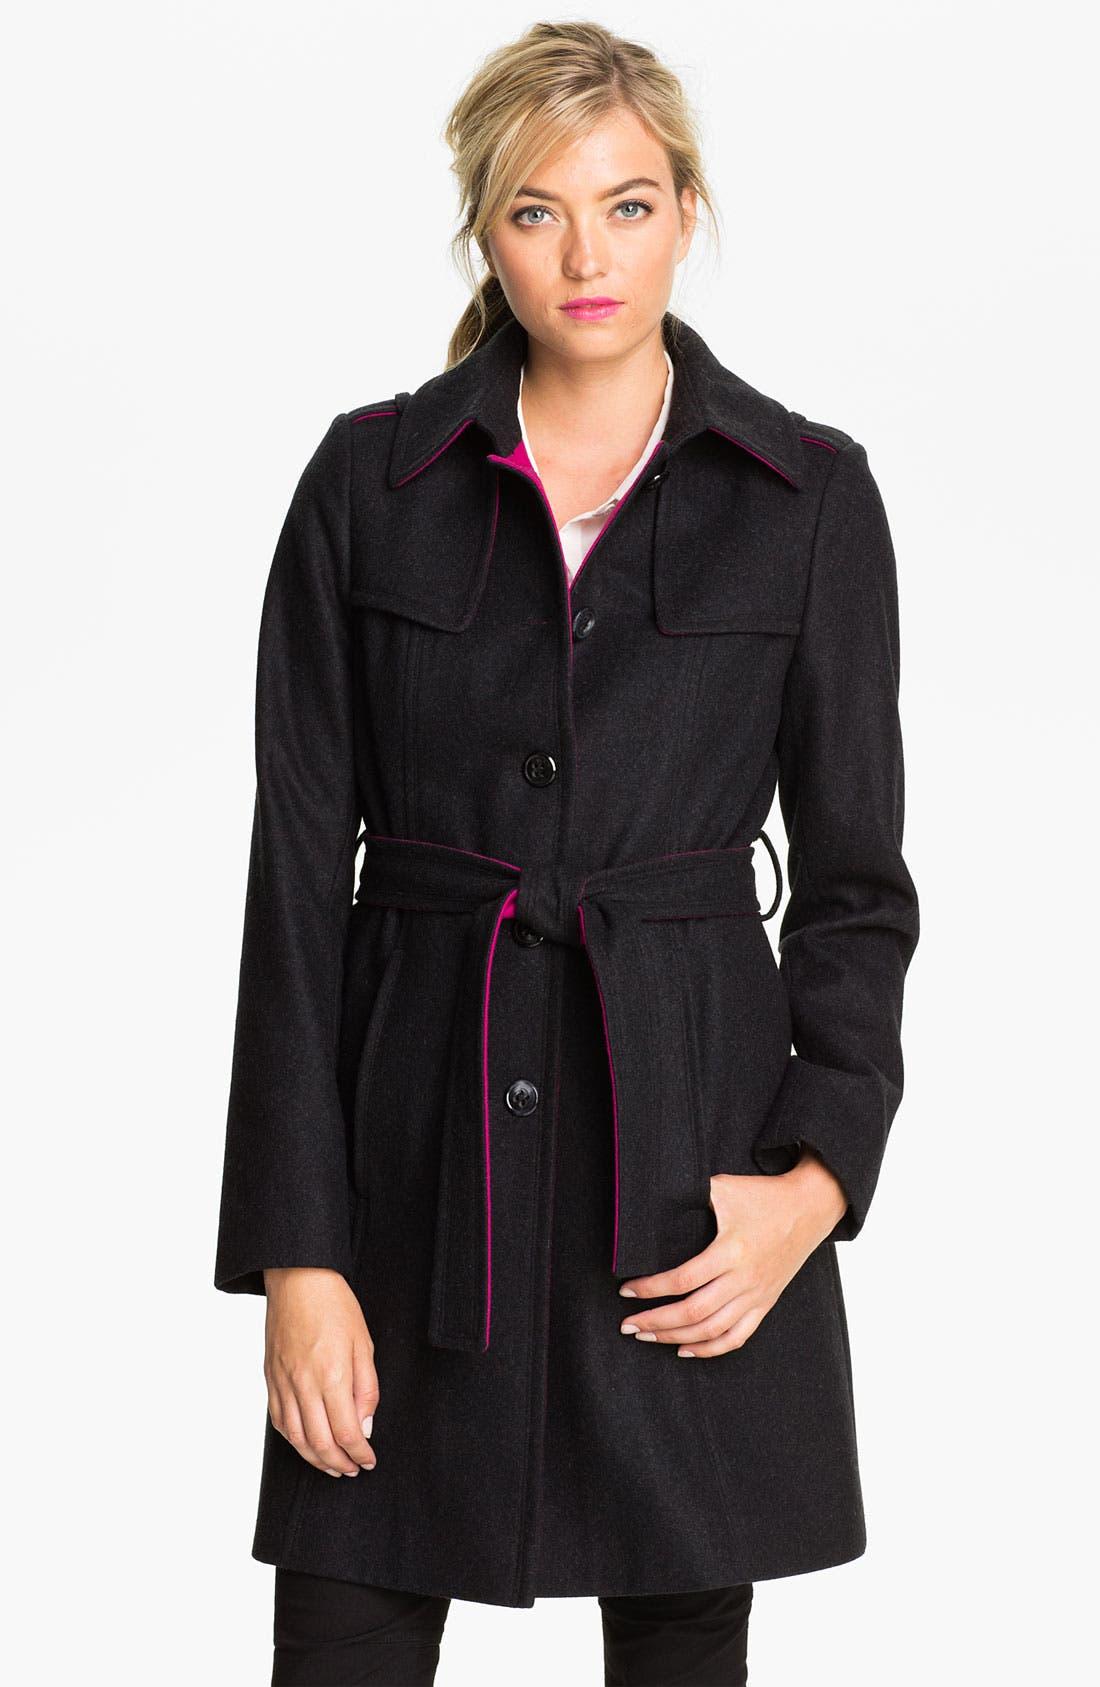 Alternate Image 1 Selected - DKNY Contrast Trim Wool Blend Coat